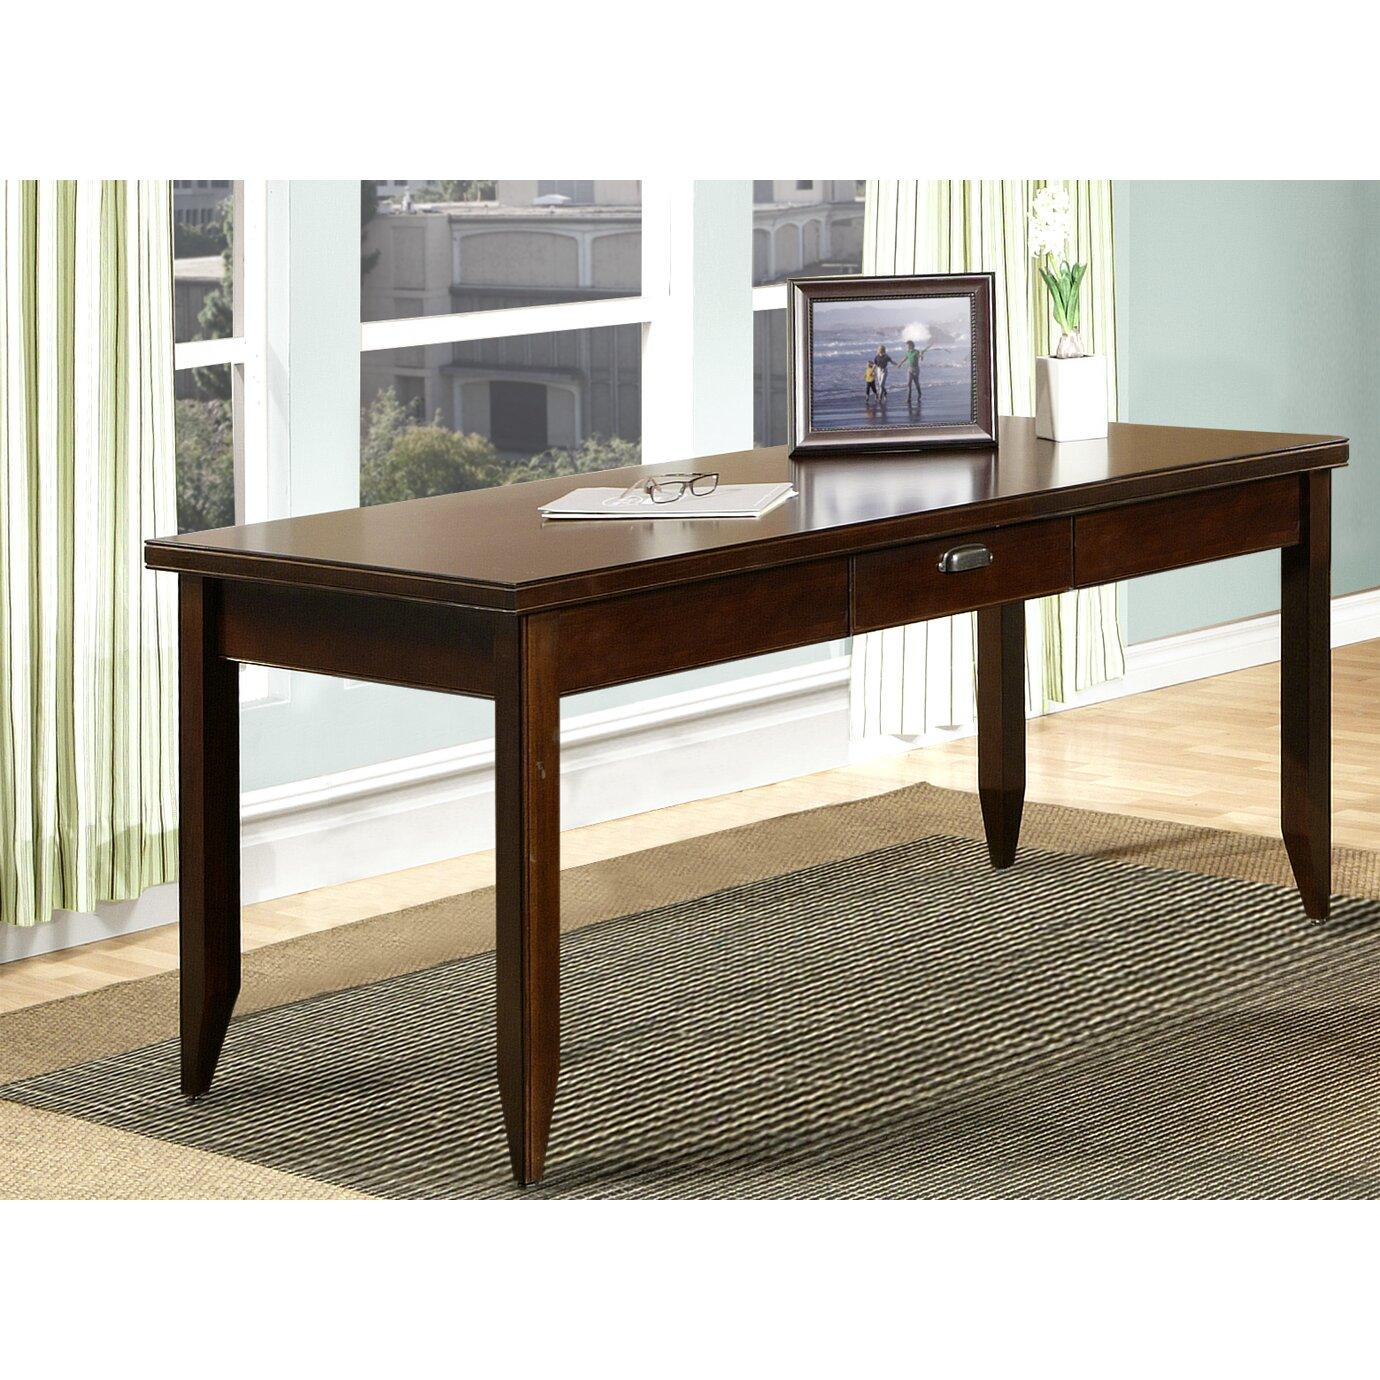 Aspenhome Warm Cherry Executive Modular Home Office: Kathy Ireland Home By Martin Furniture Tribeca Loft L-Desk